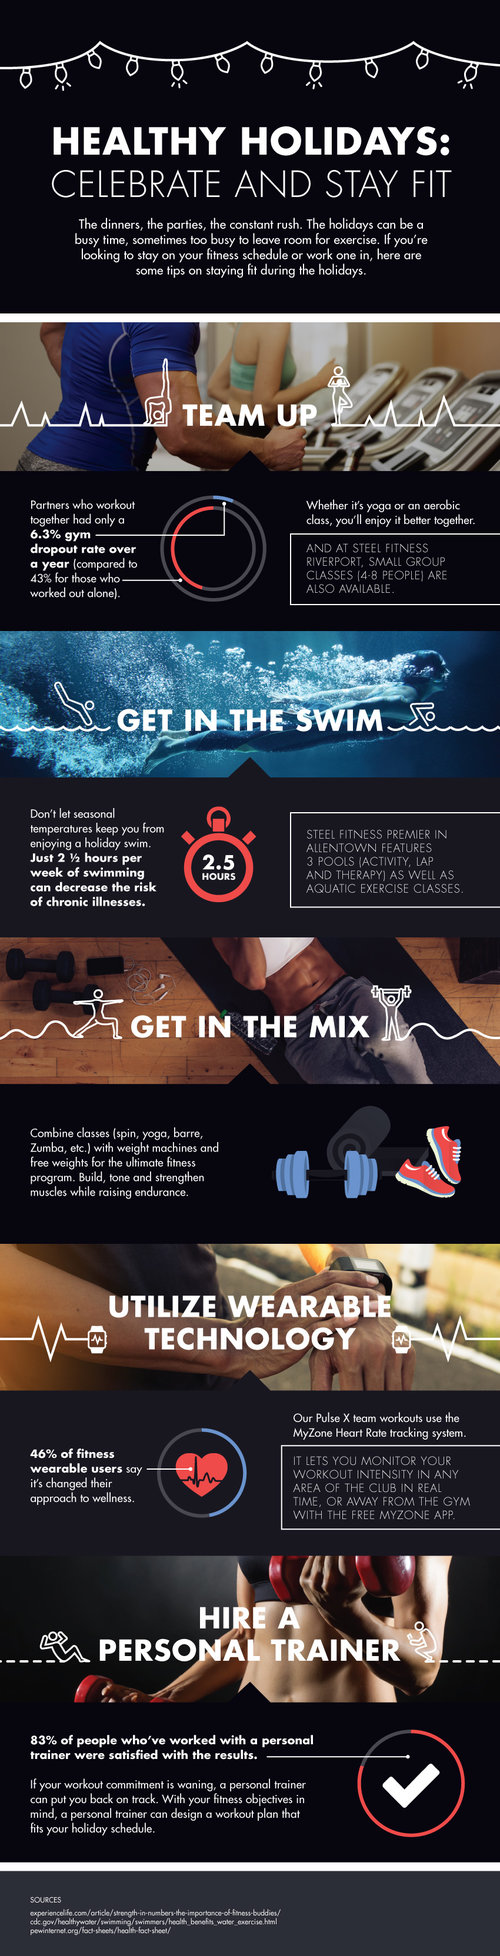 Facts-Fitness_GG_12.12_edits.jpg